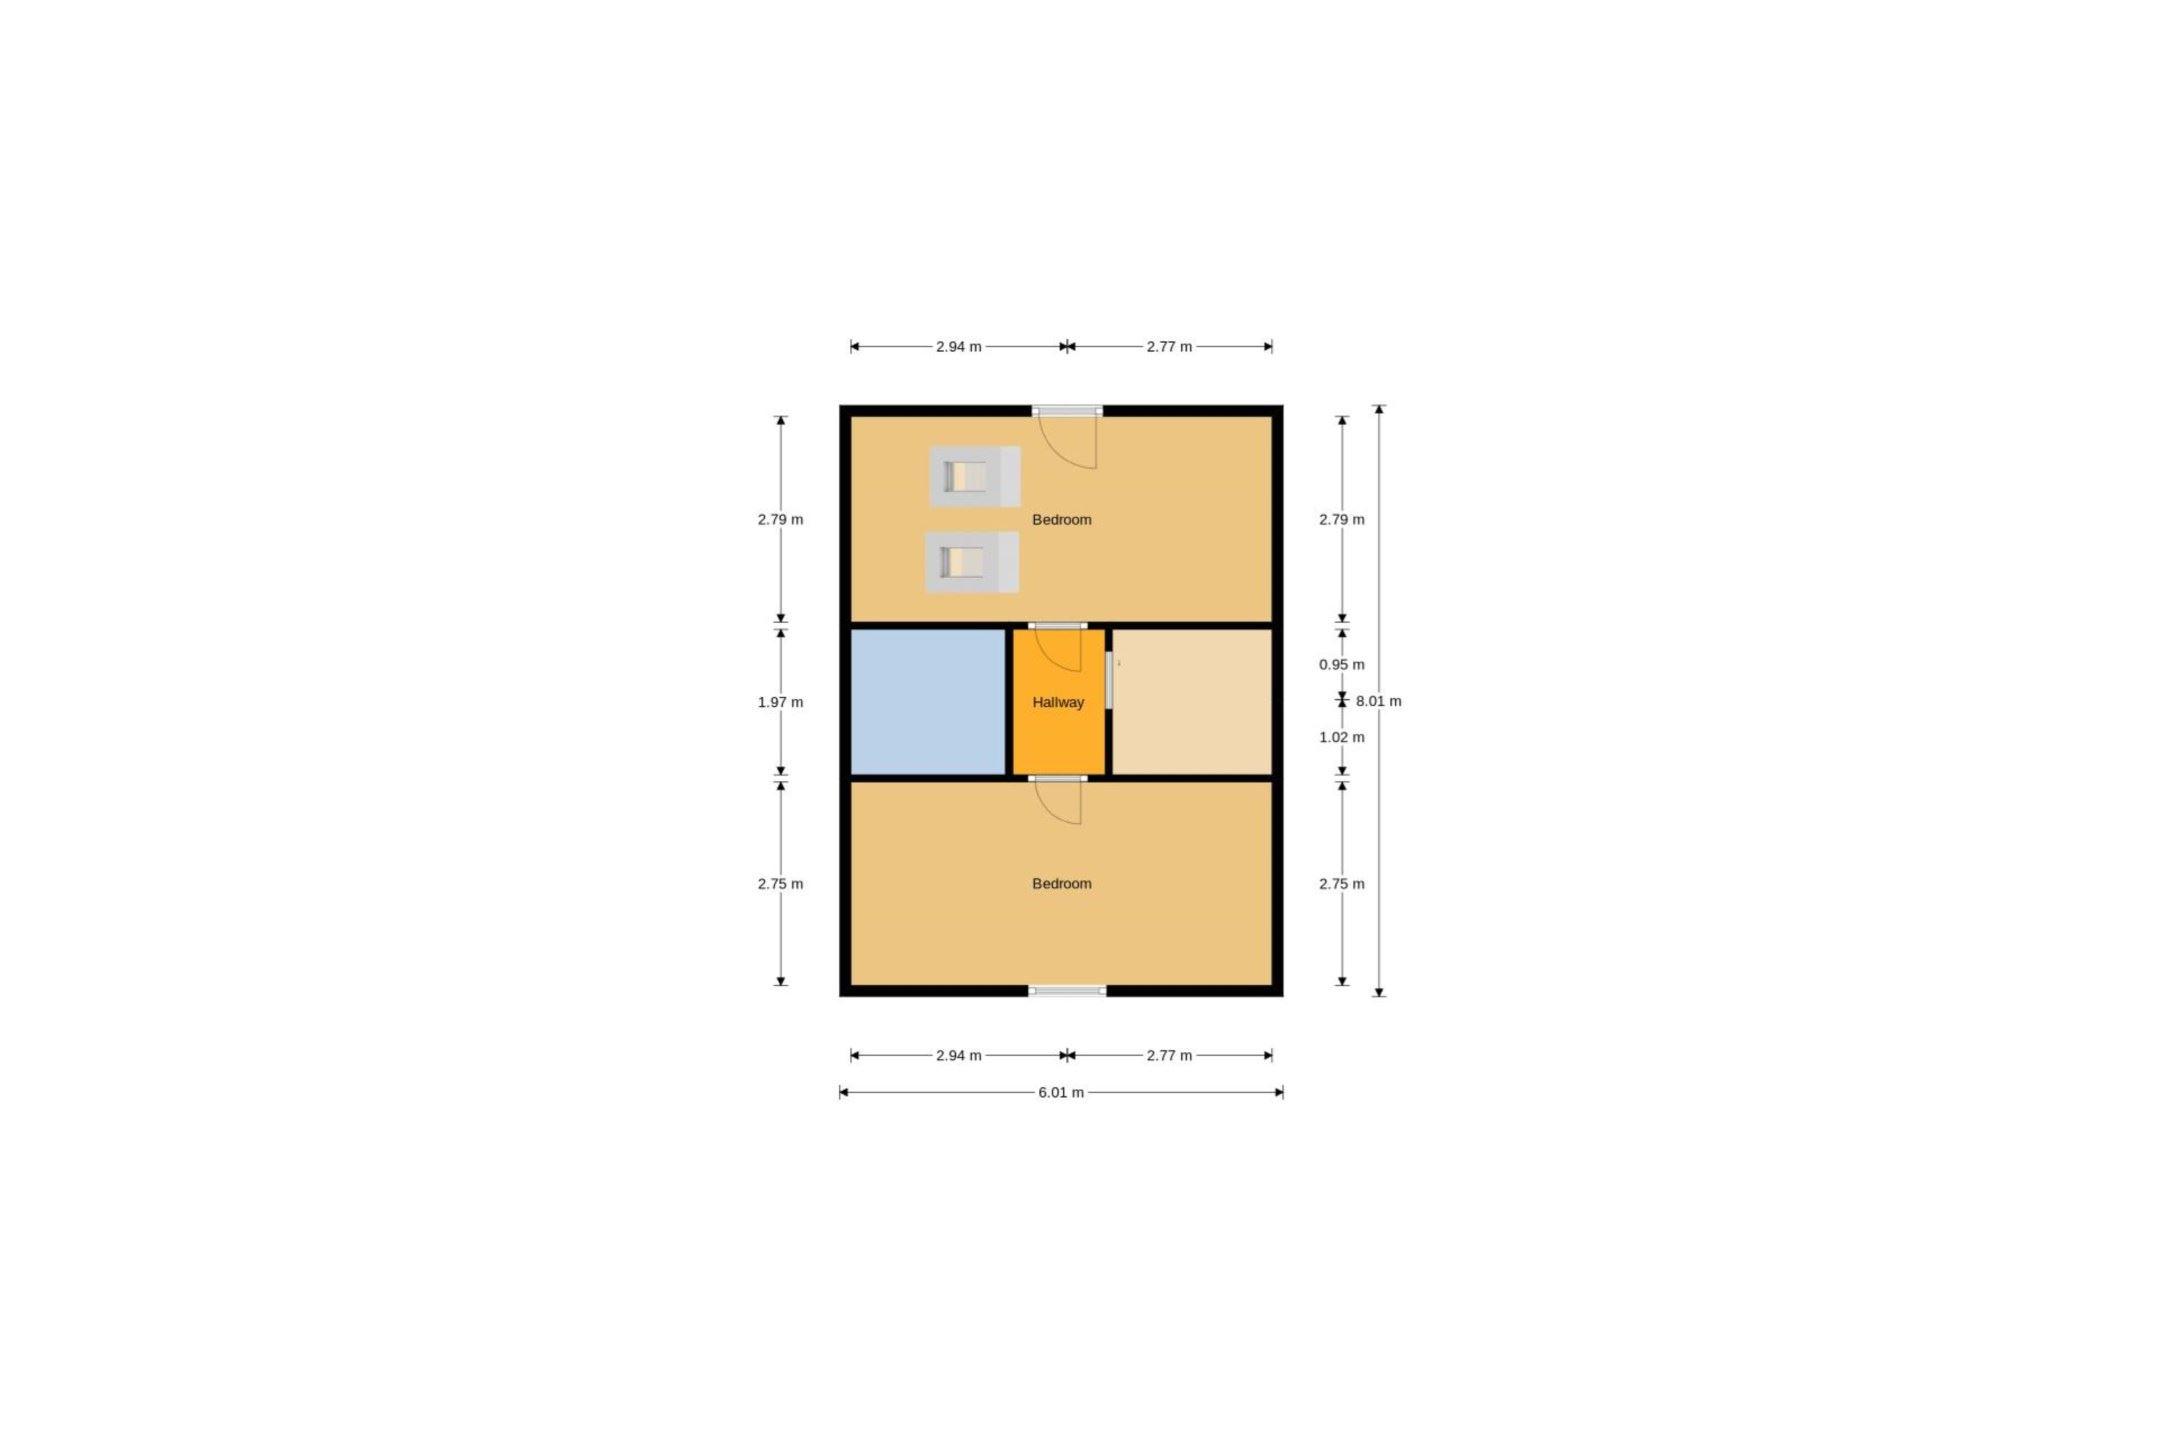 Verkocht Westendorperheideweg 16 8166 Hx Emst Funda